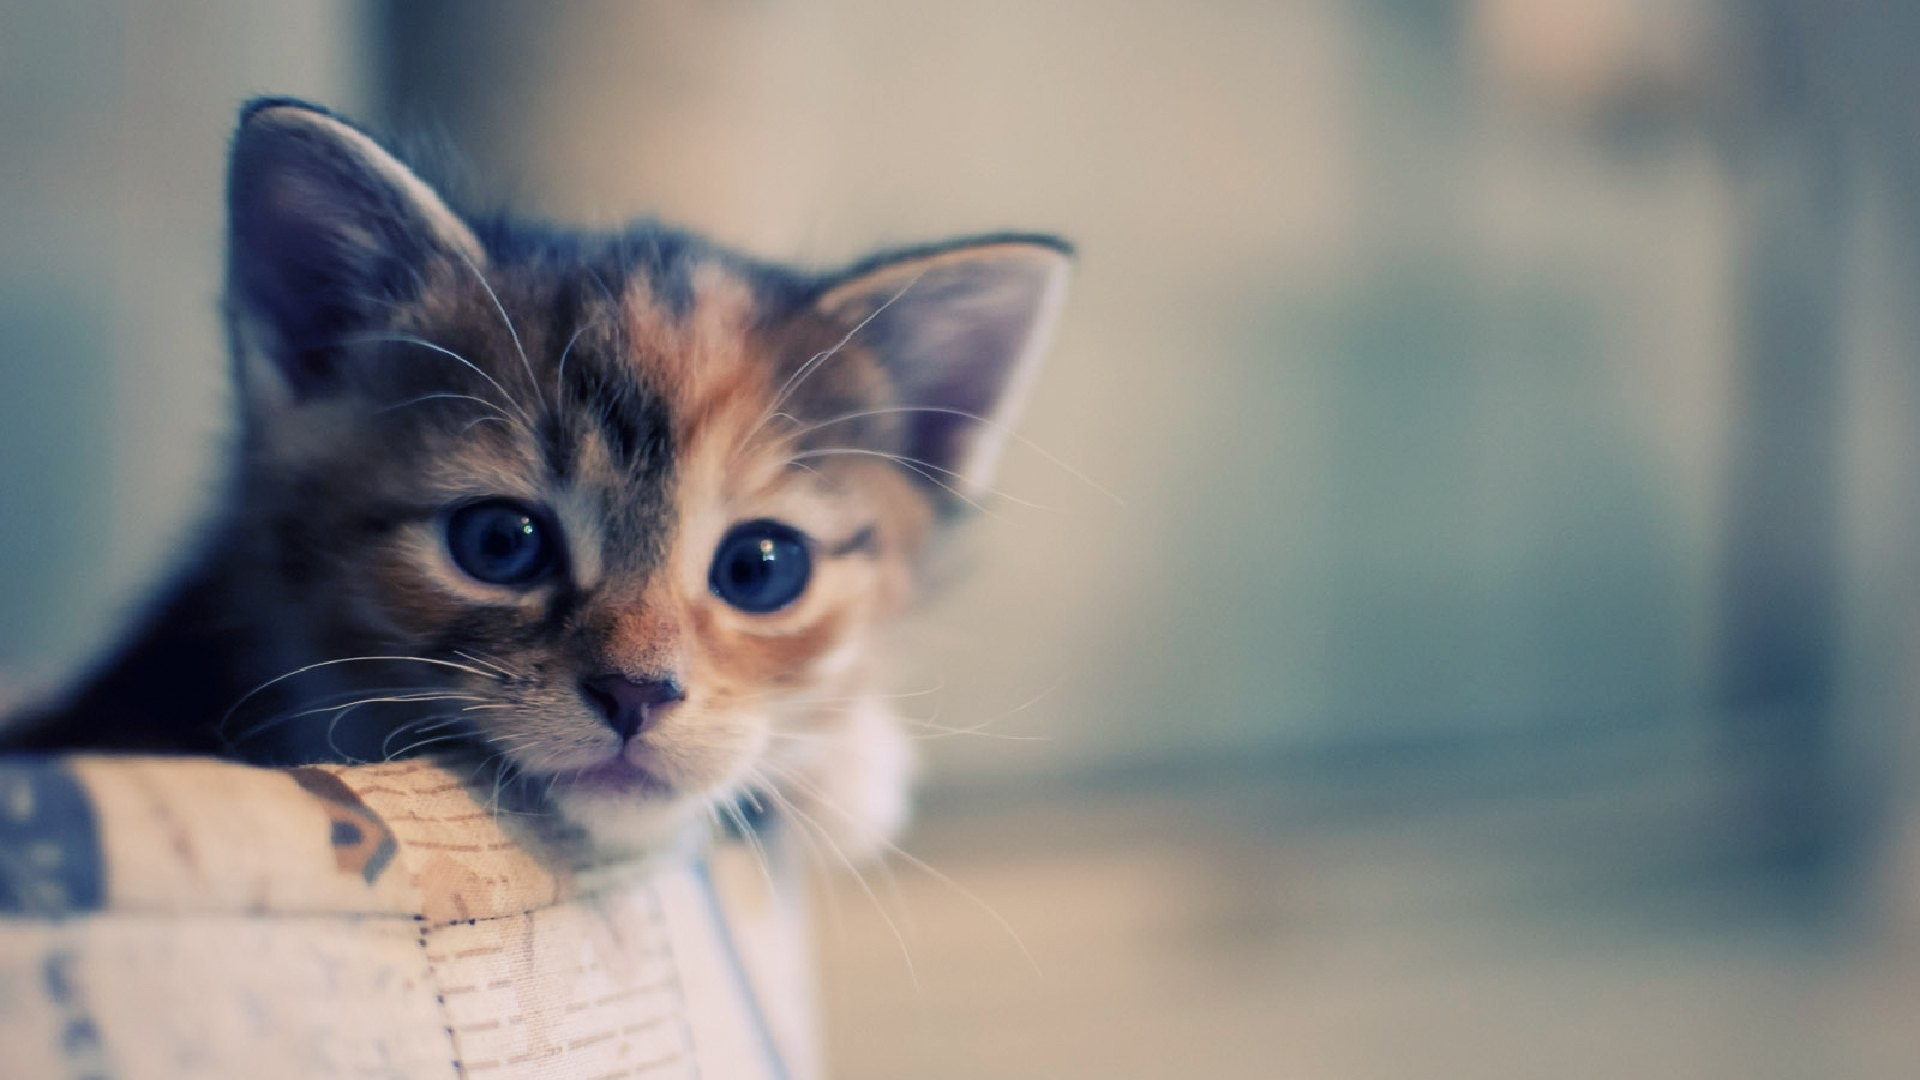 Cute Cat Wallpaper for Desktop   HD Wallpapers   Pinterest   Cat wallpaper, Hd  wallpaper and Wallpaper